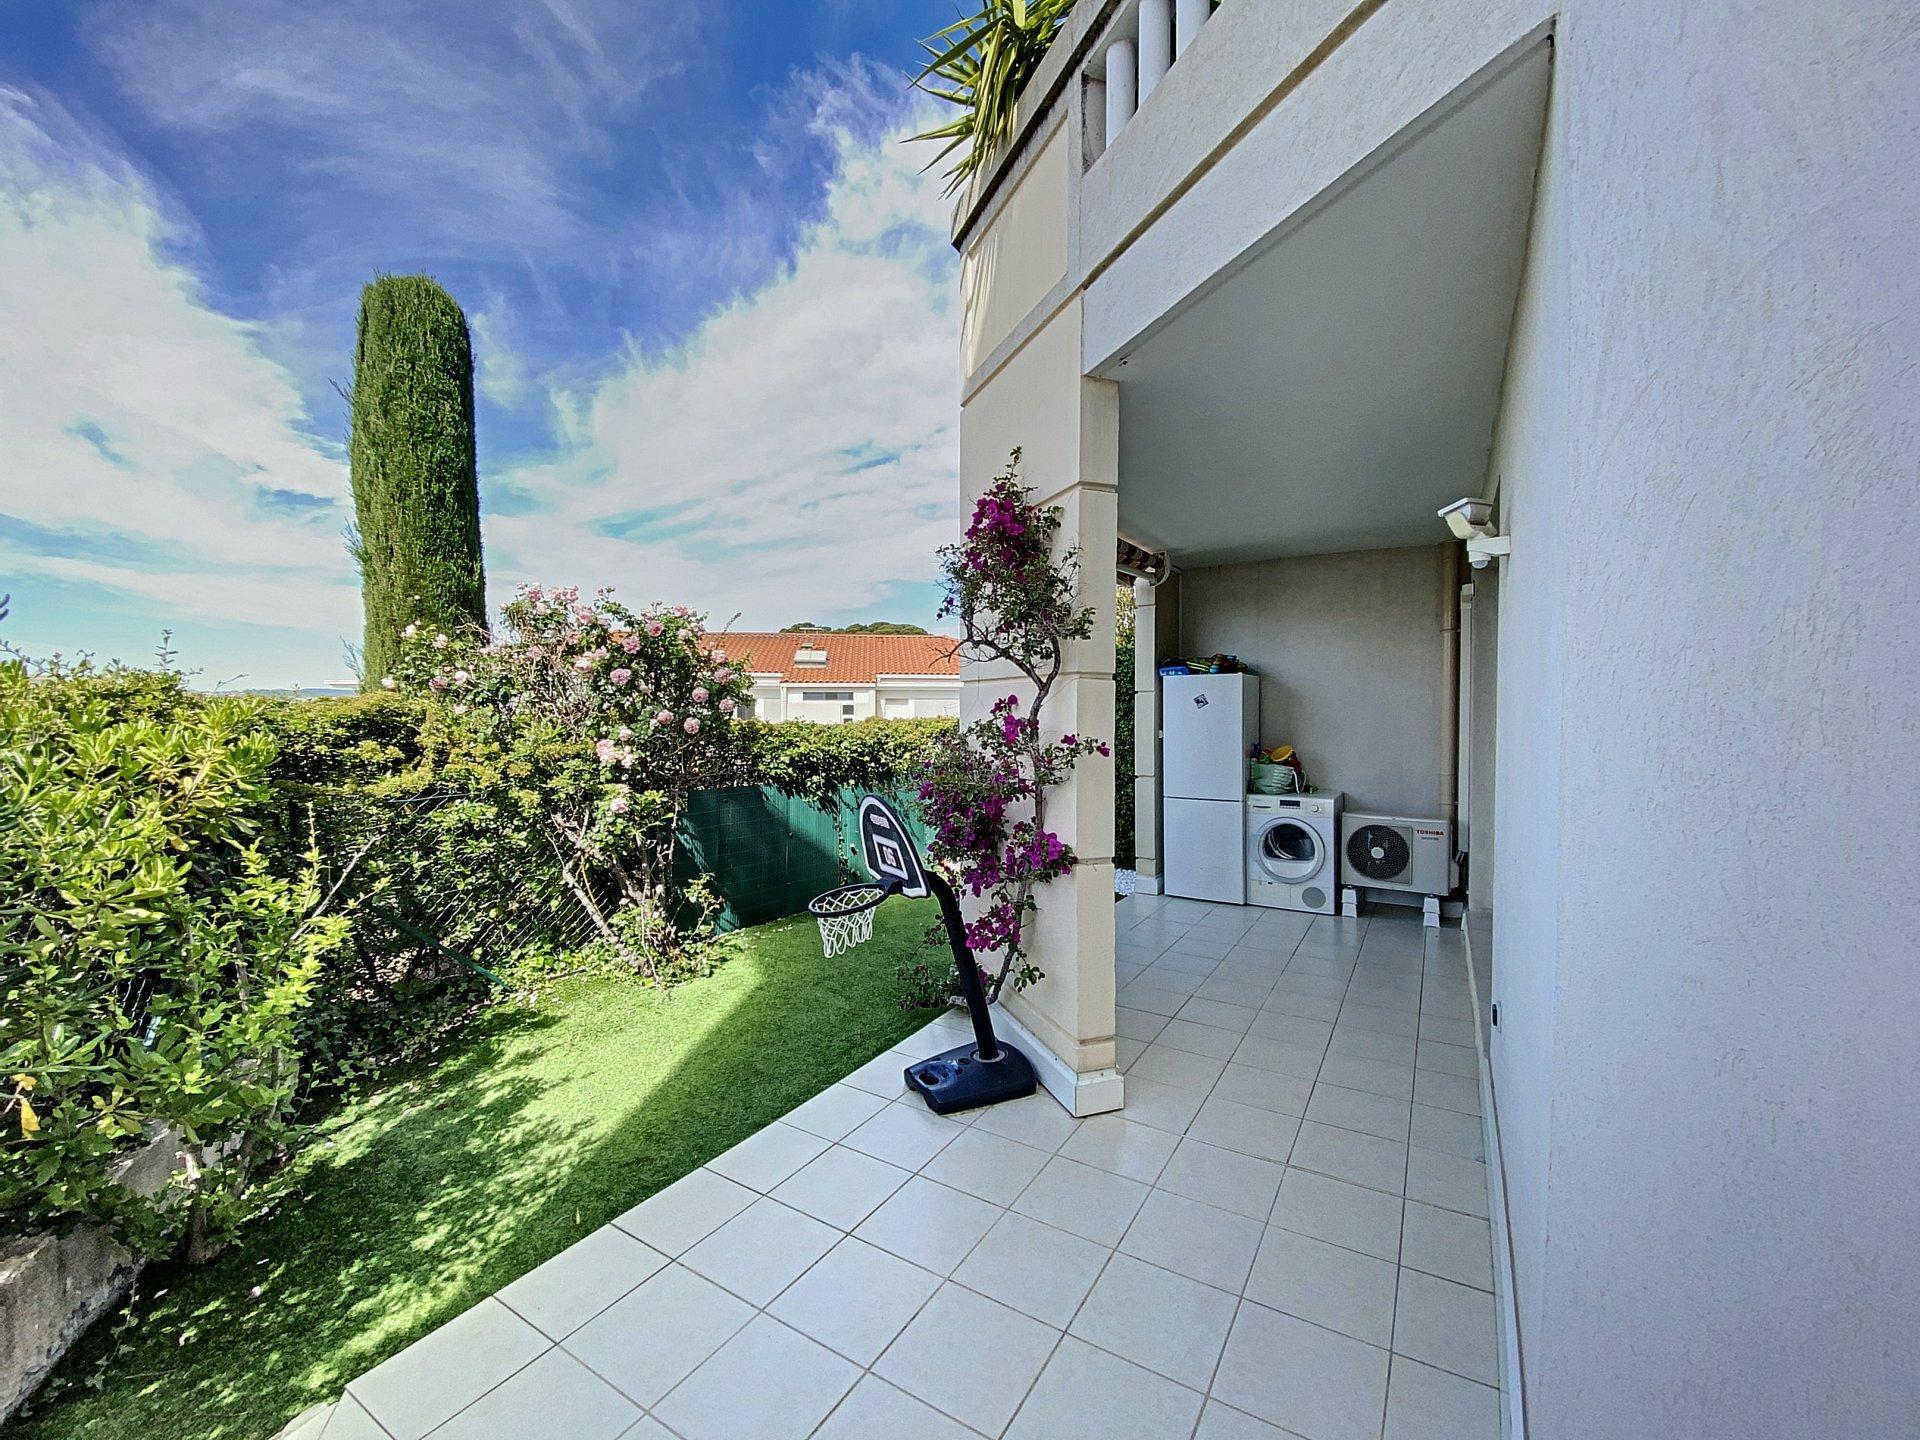 SAINT-LAURENT-DU-VAR (06700) - Vue Mer - Appartement 4P 82m² - TERRASSE - JARDIN - CAVE - GARAGE